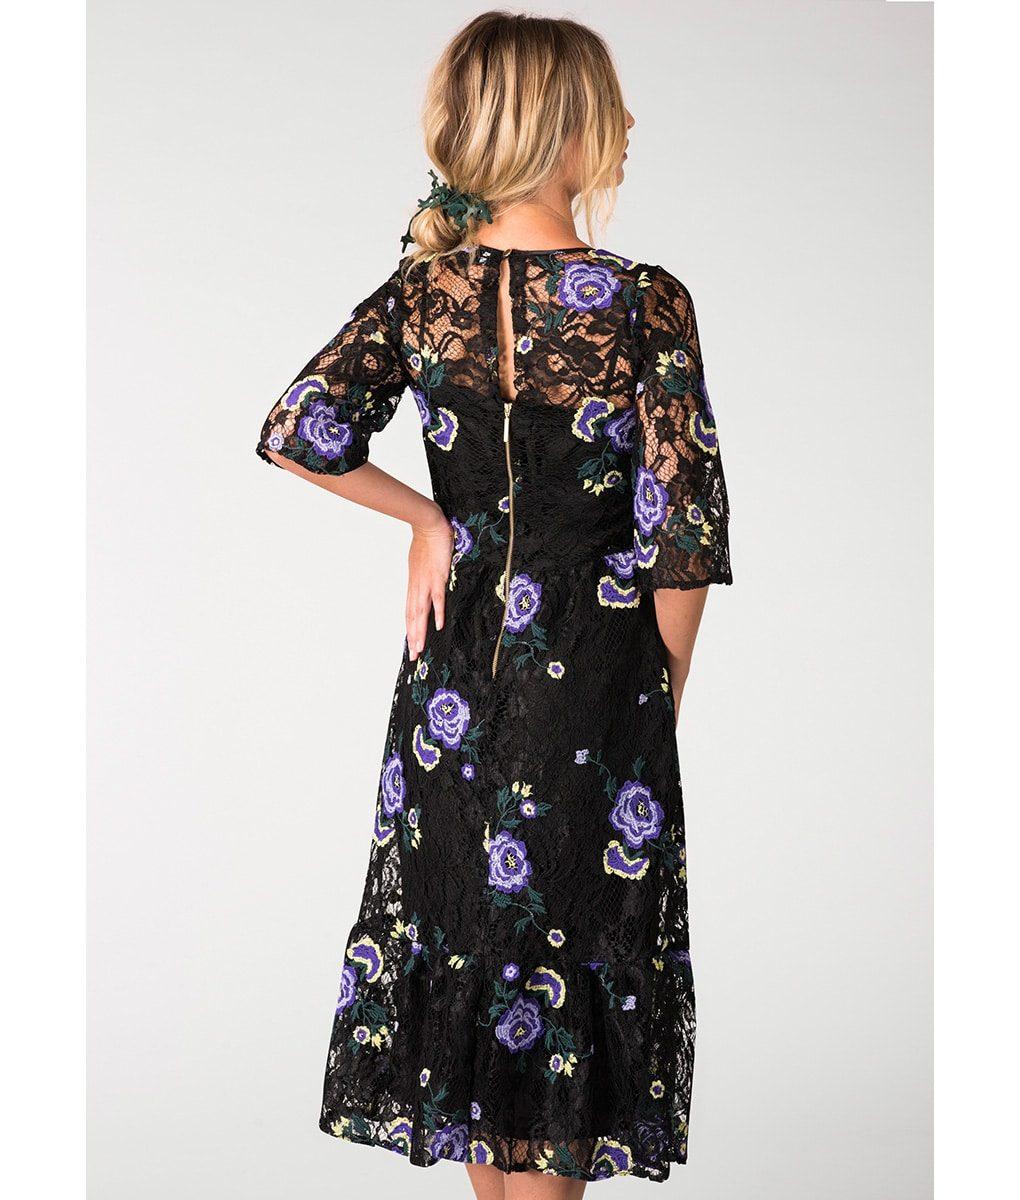 Closet London Floral Black Lace Dress Alila